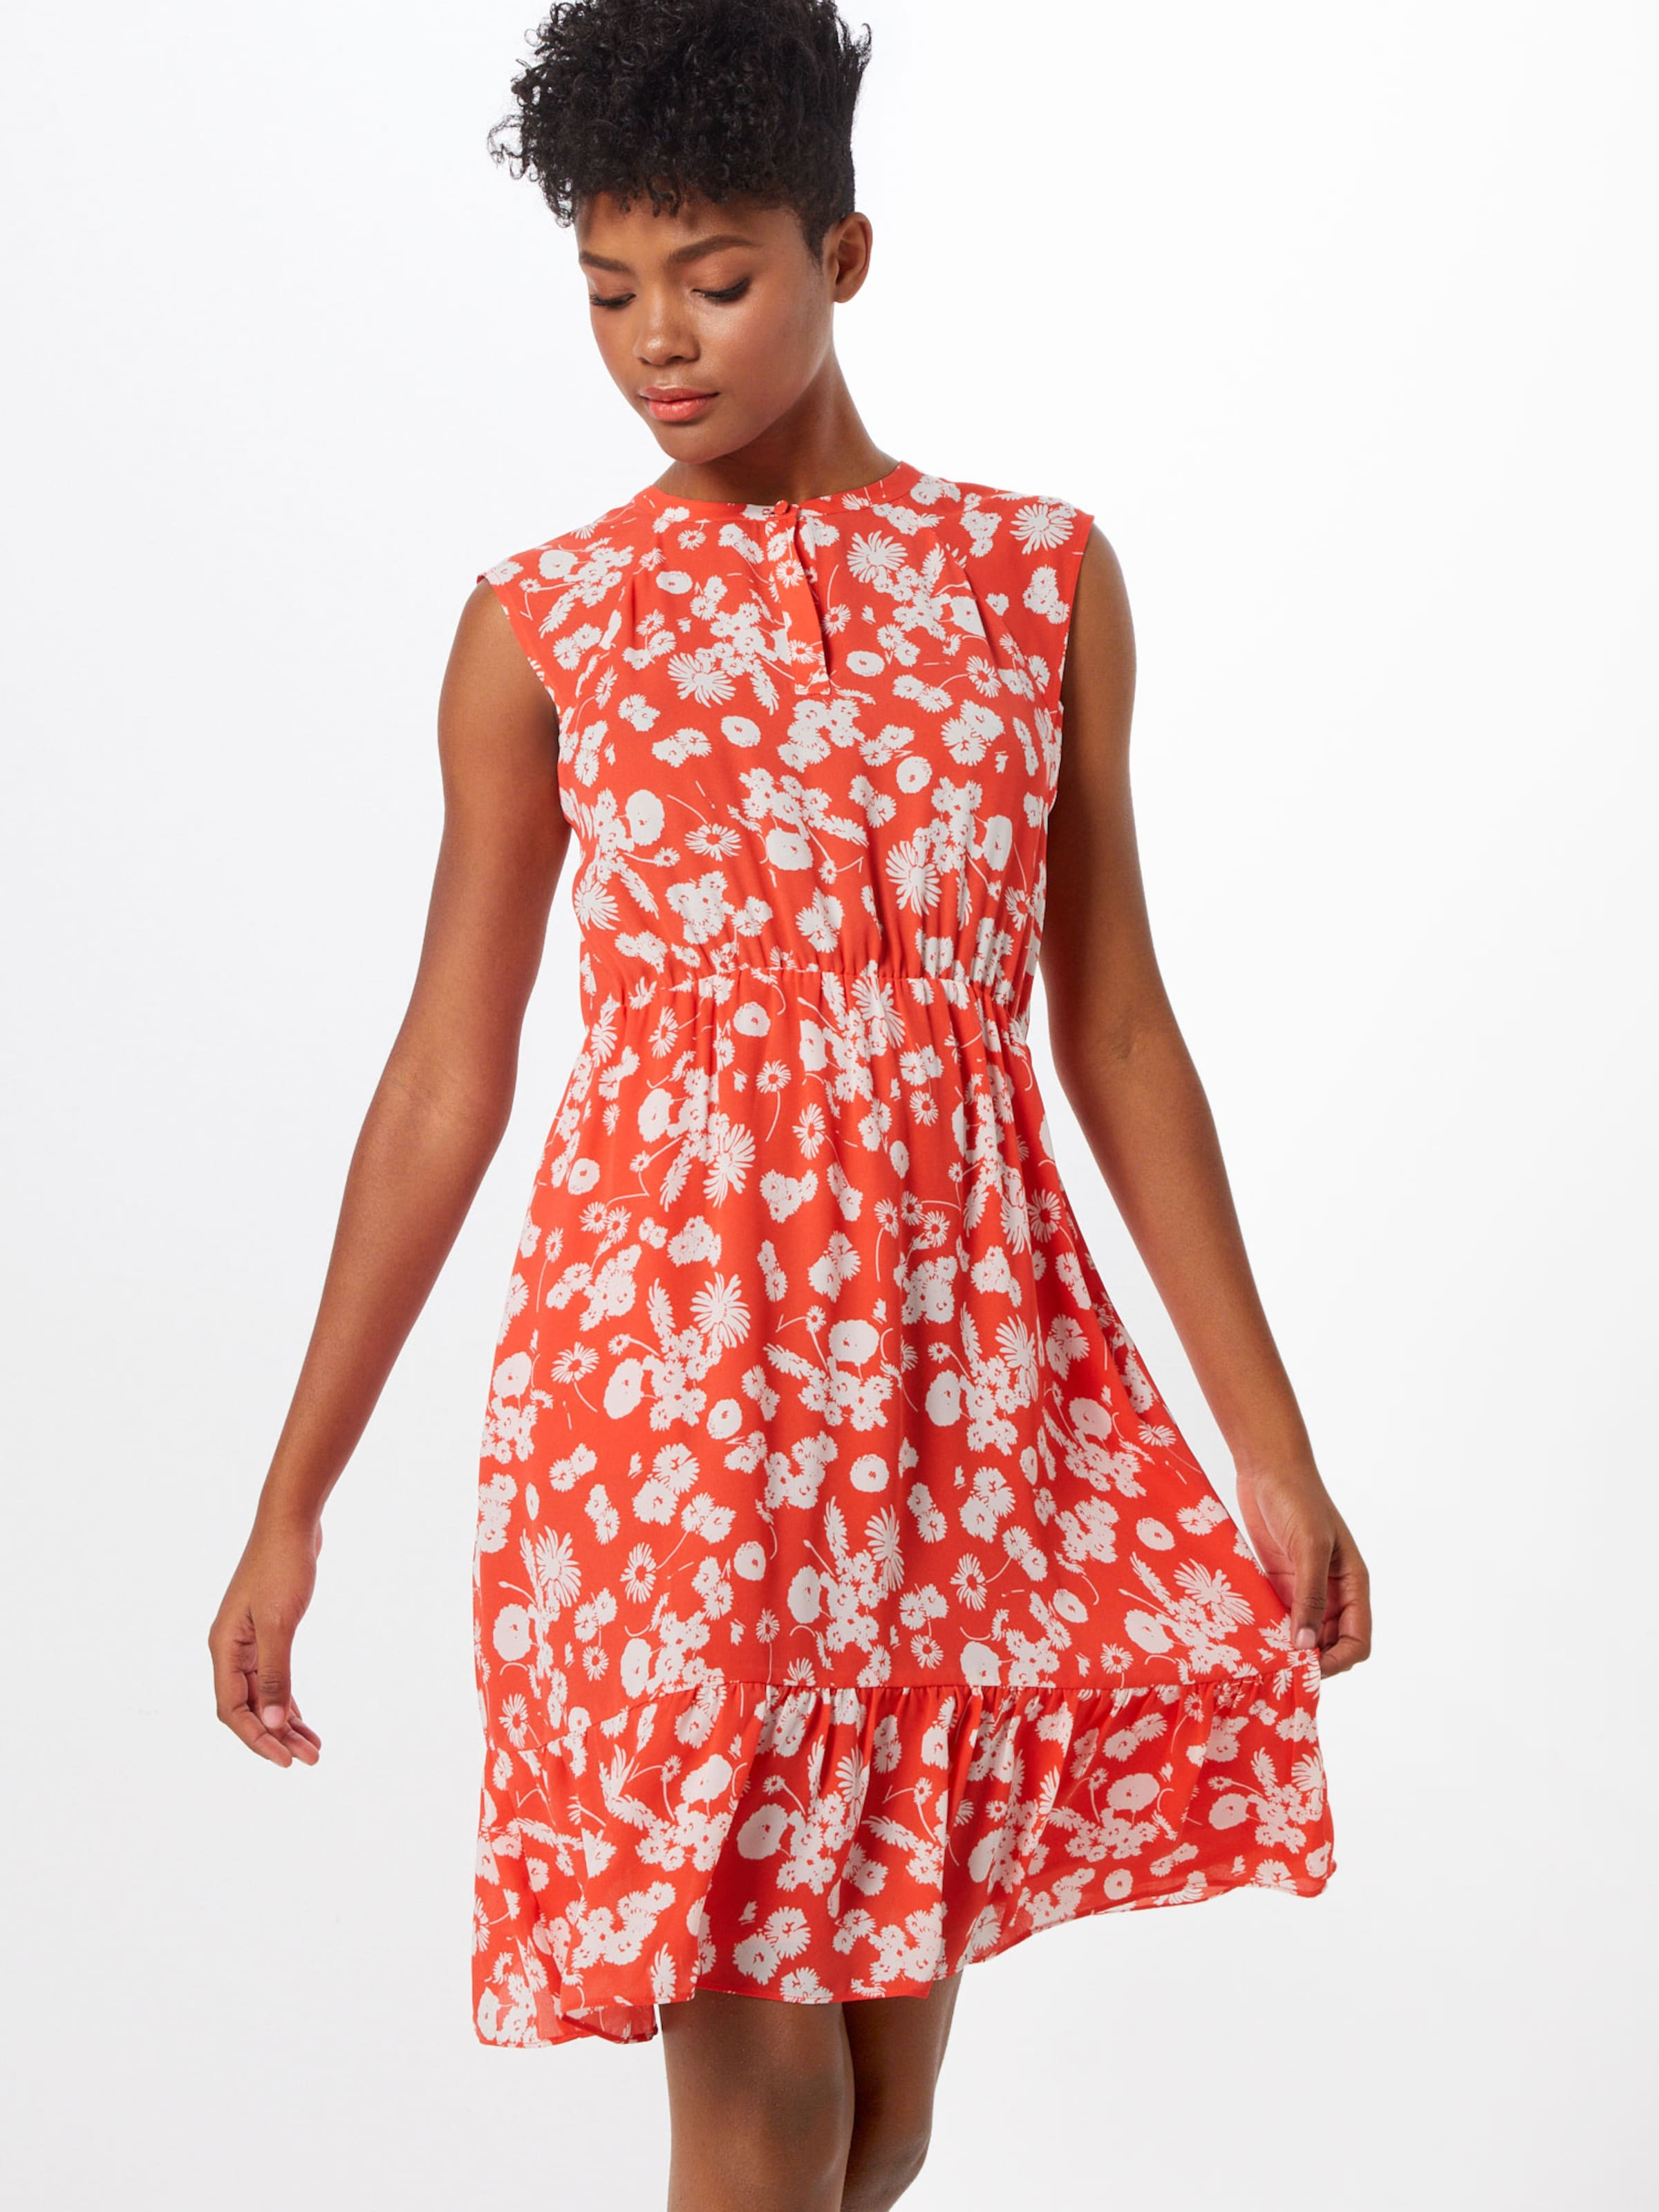 'wolise' In Opus Ecbweqrxod Orangerot Kleid 0nPX8ONwk